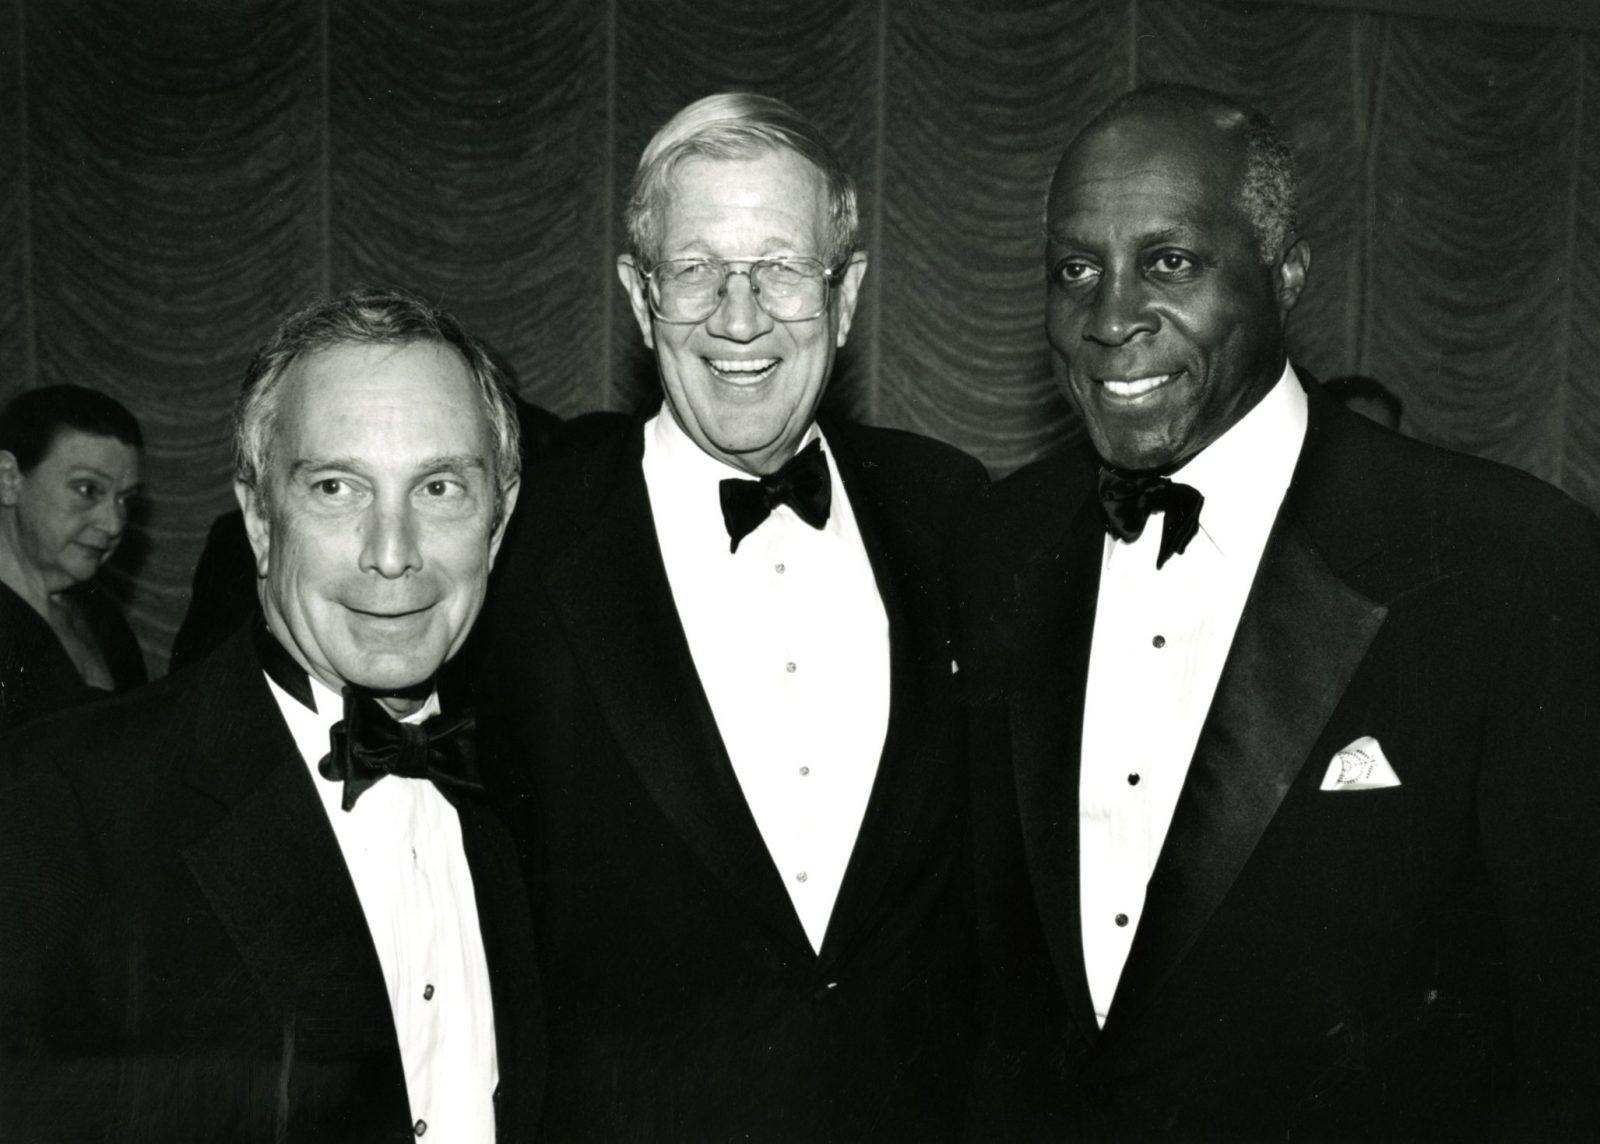 Bloomberg, Luers and Jordan